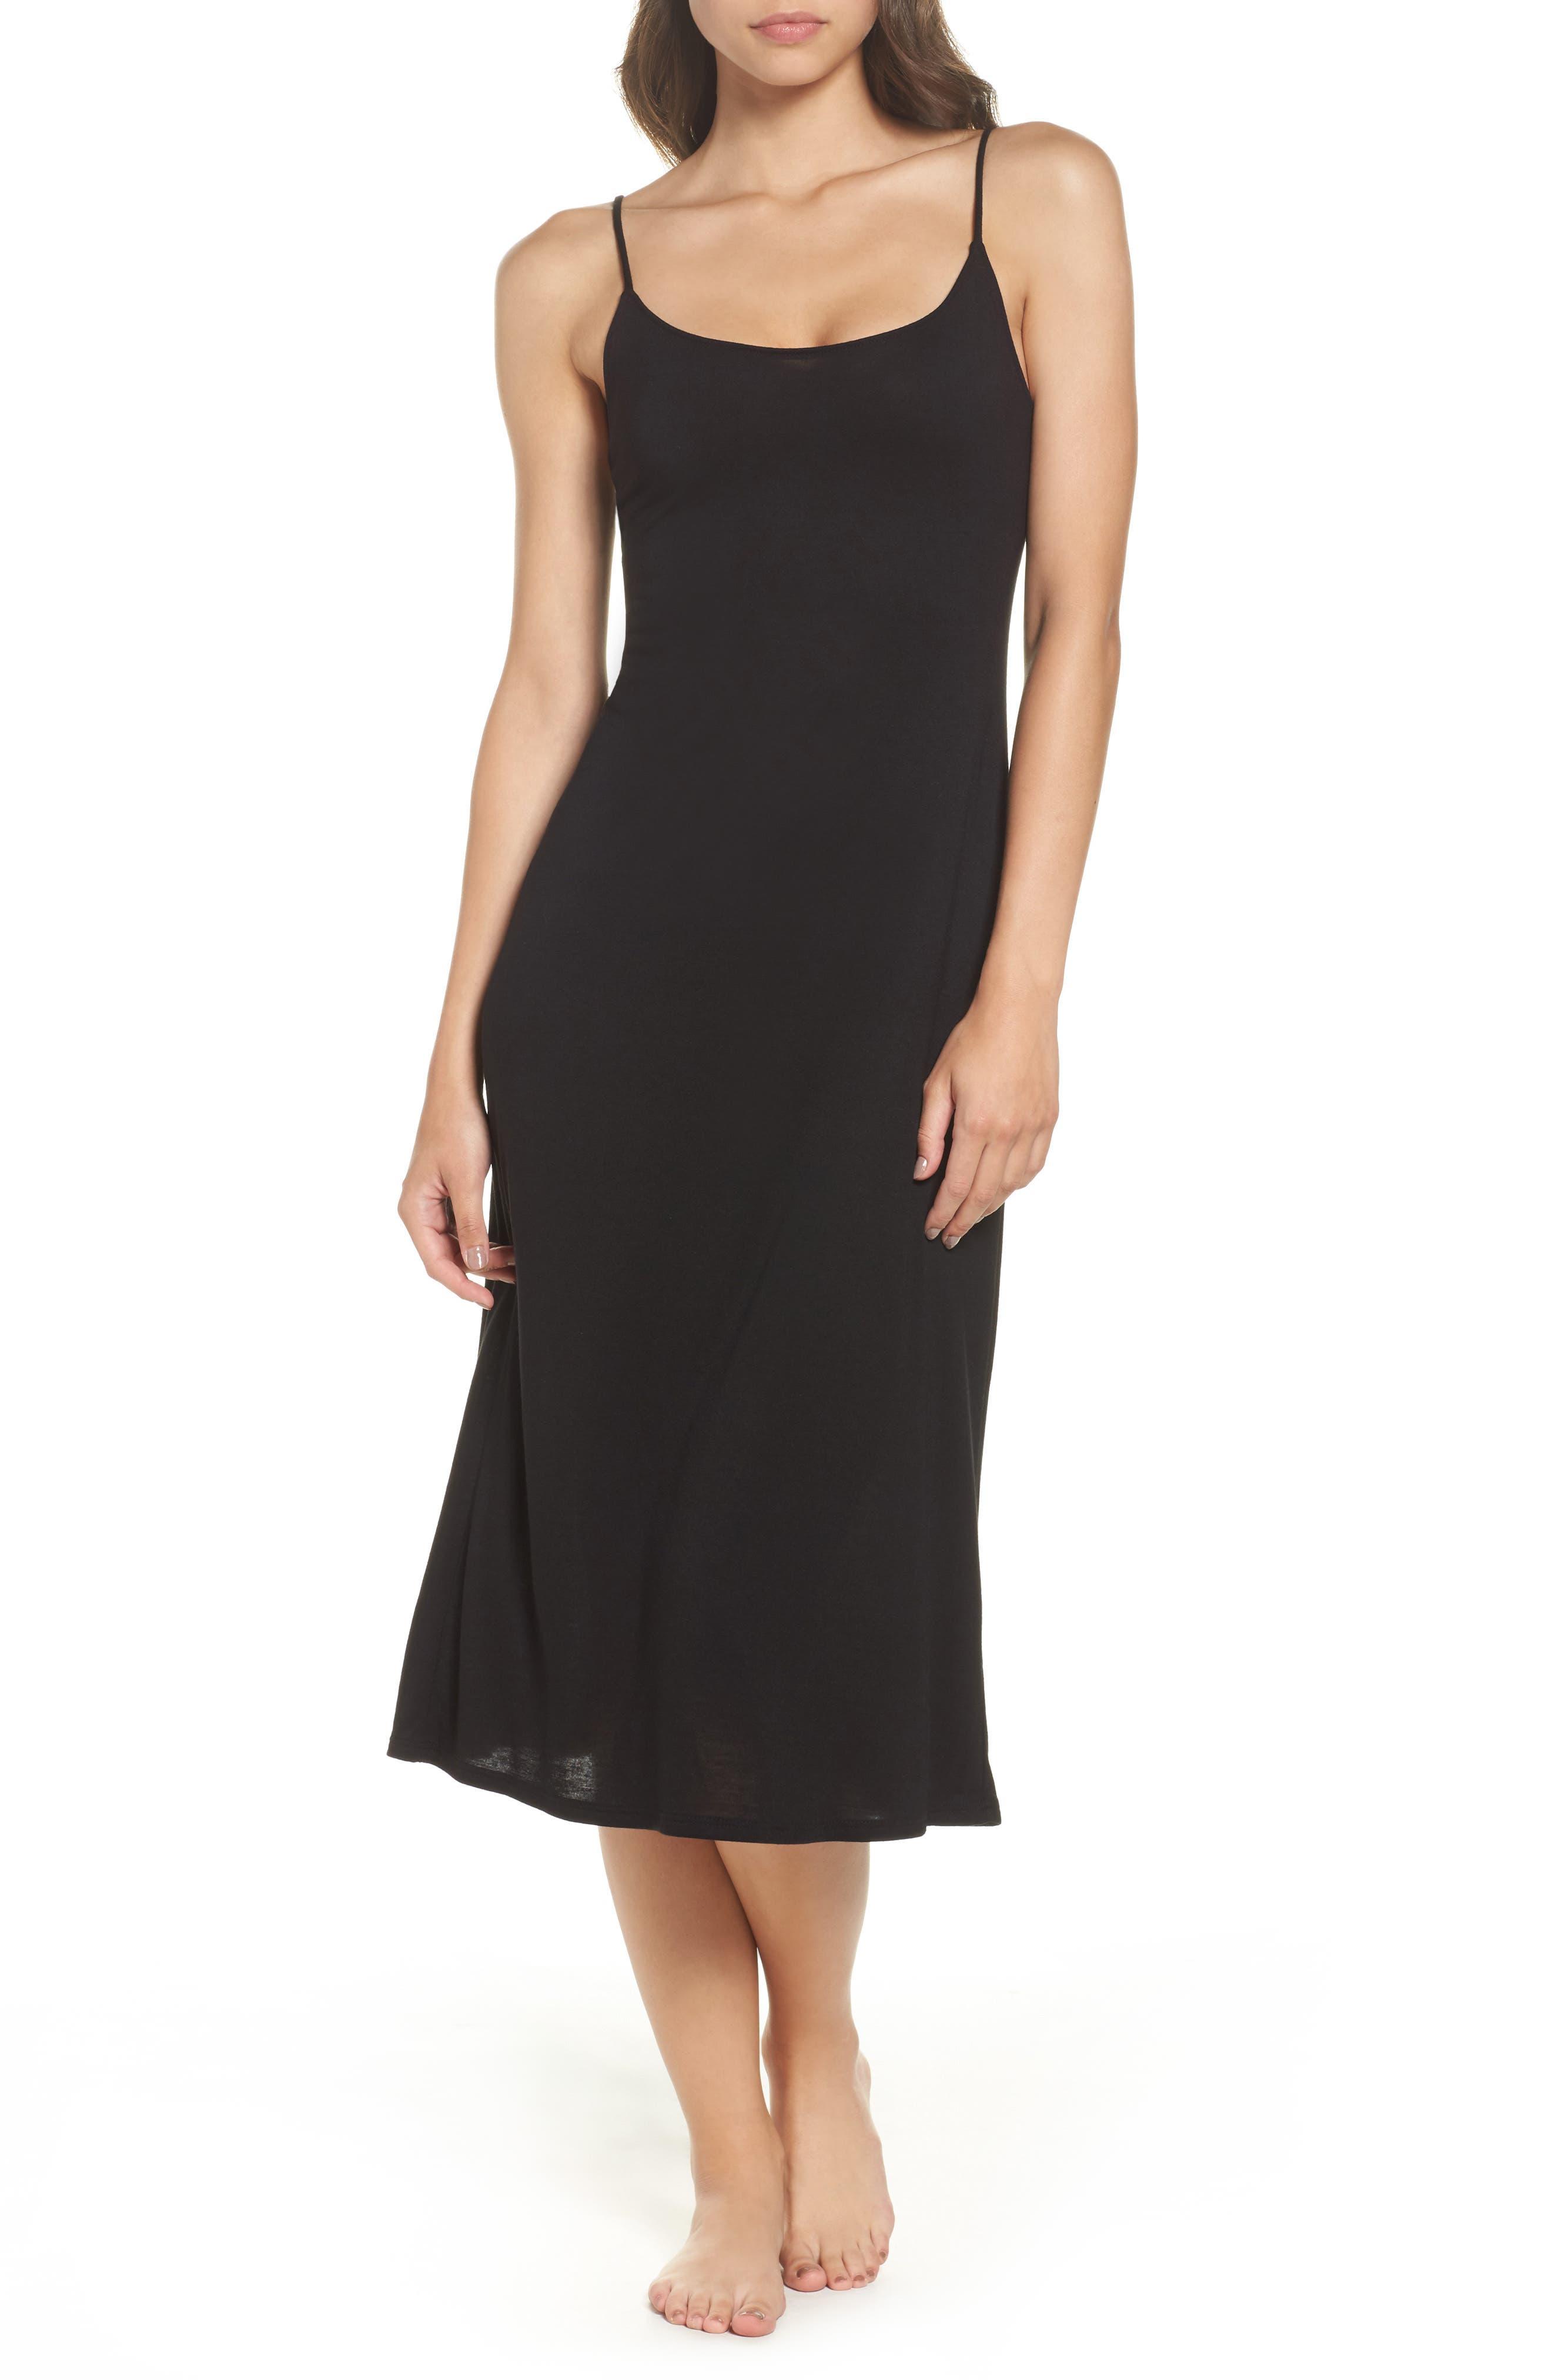 NATORI Shangri La Nightgown, Main, color, BLACK